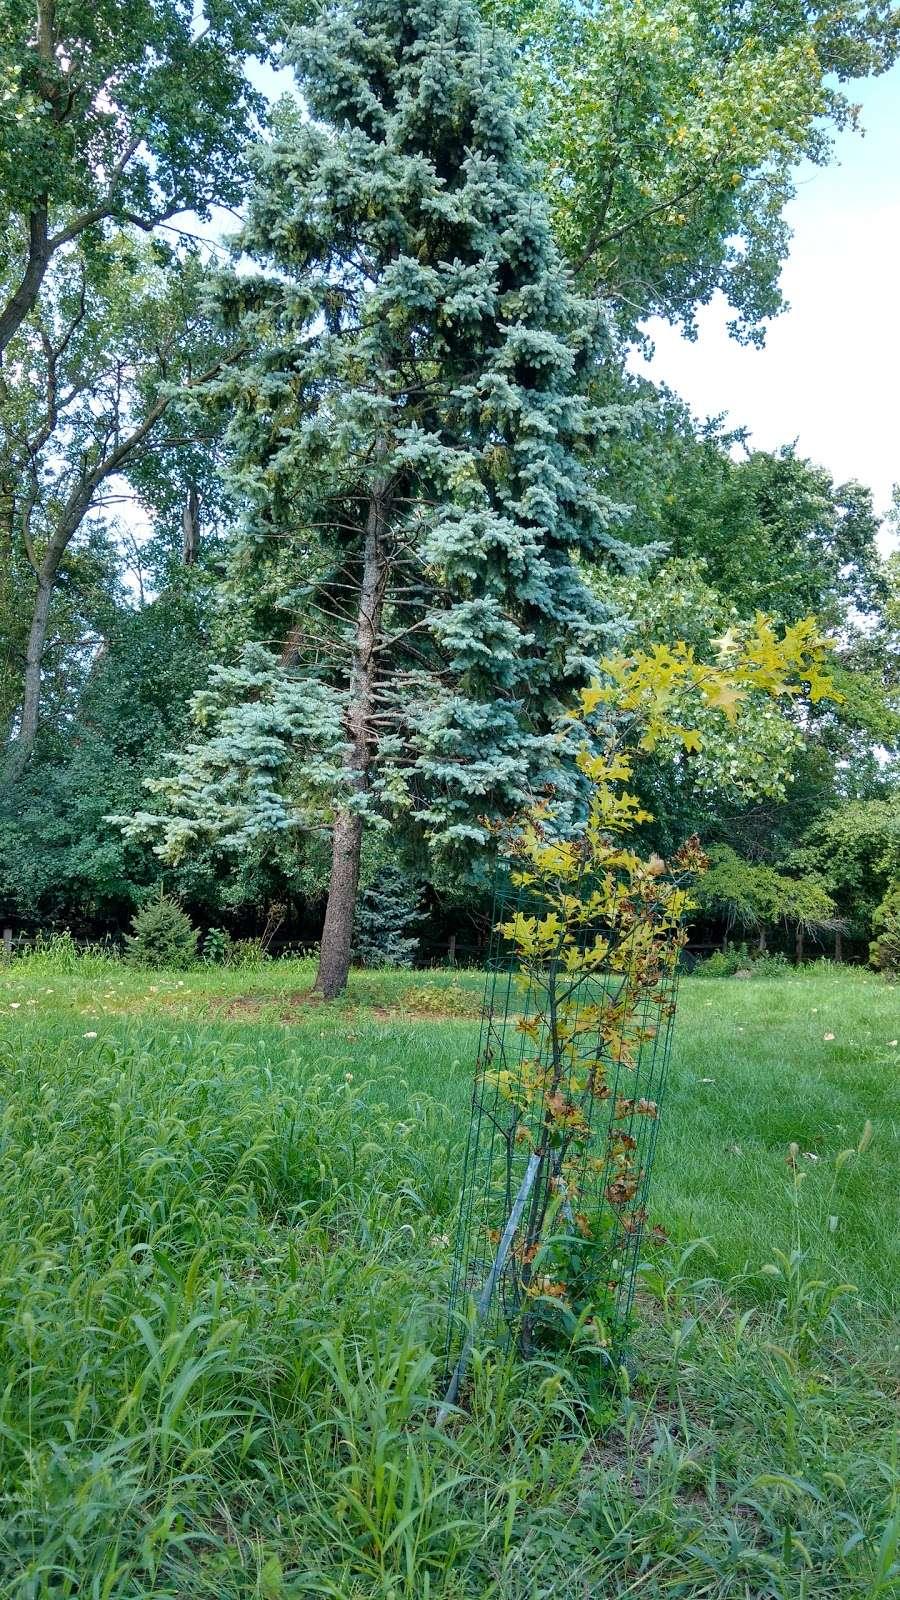 Triton College Botanical Garden - park  | Photo 9 of 10 | Address: 2000 5th Ave, River Grove, IL 60171, USA | Phone: (708) 456-0300